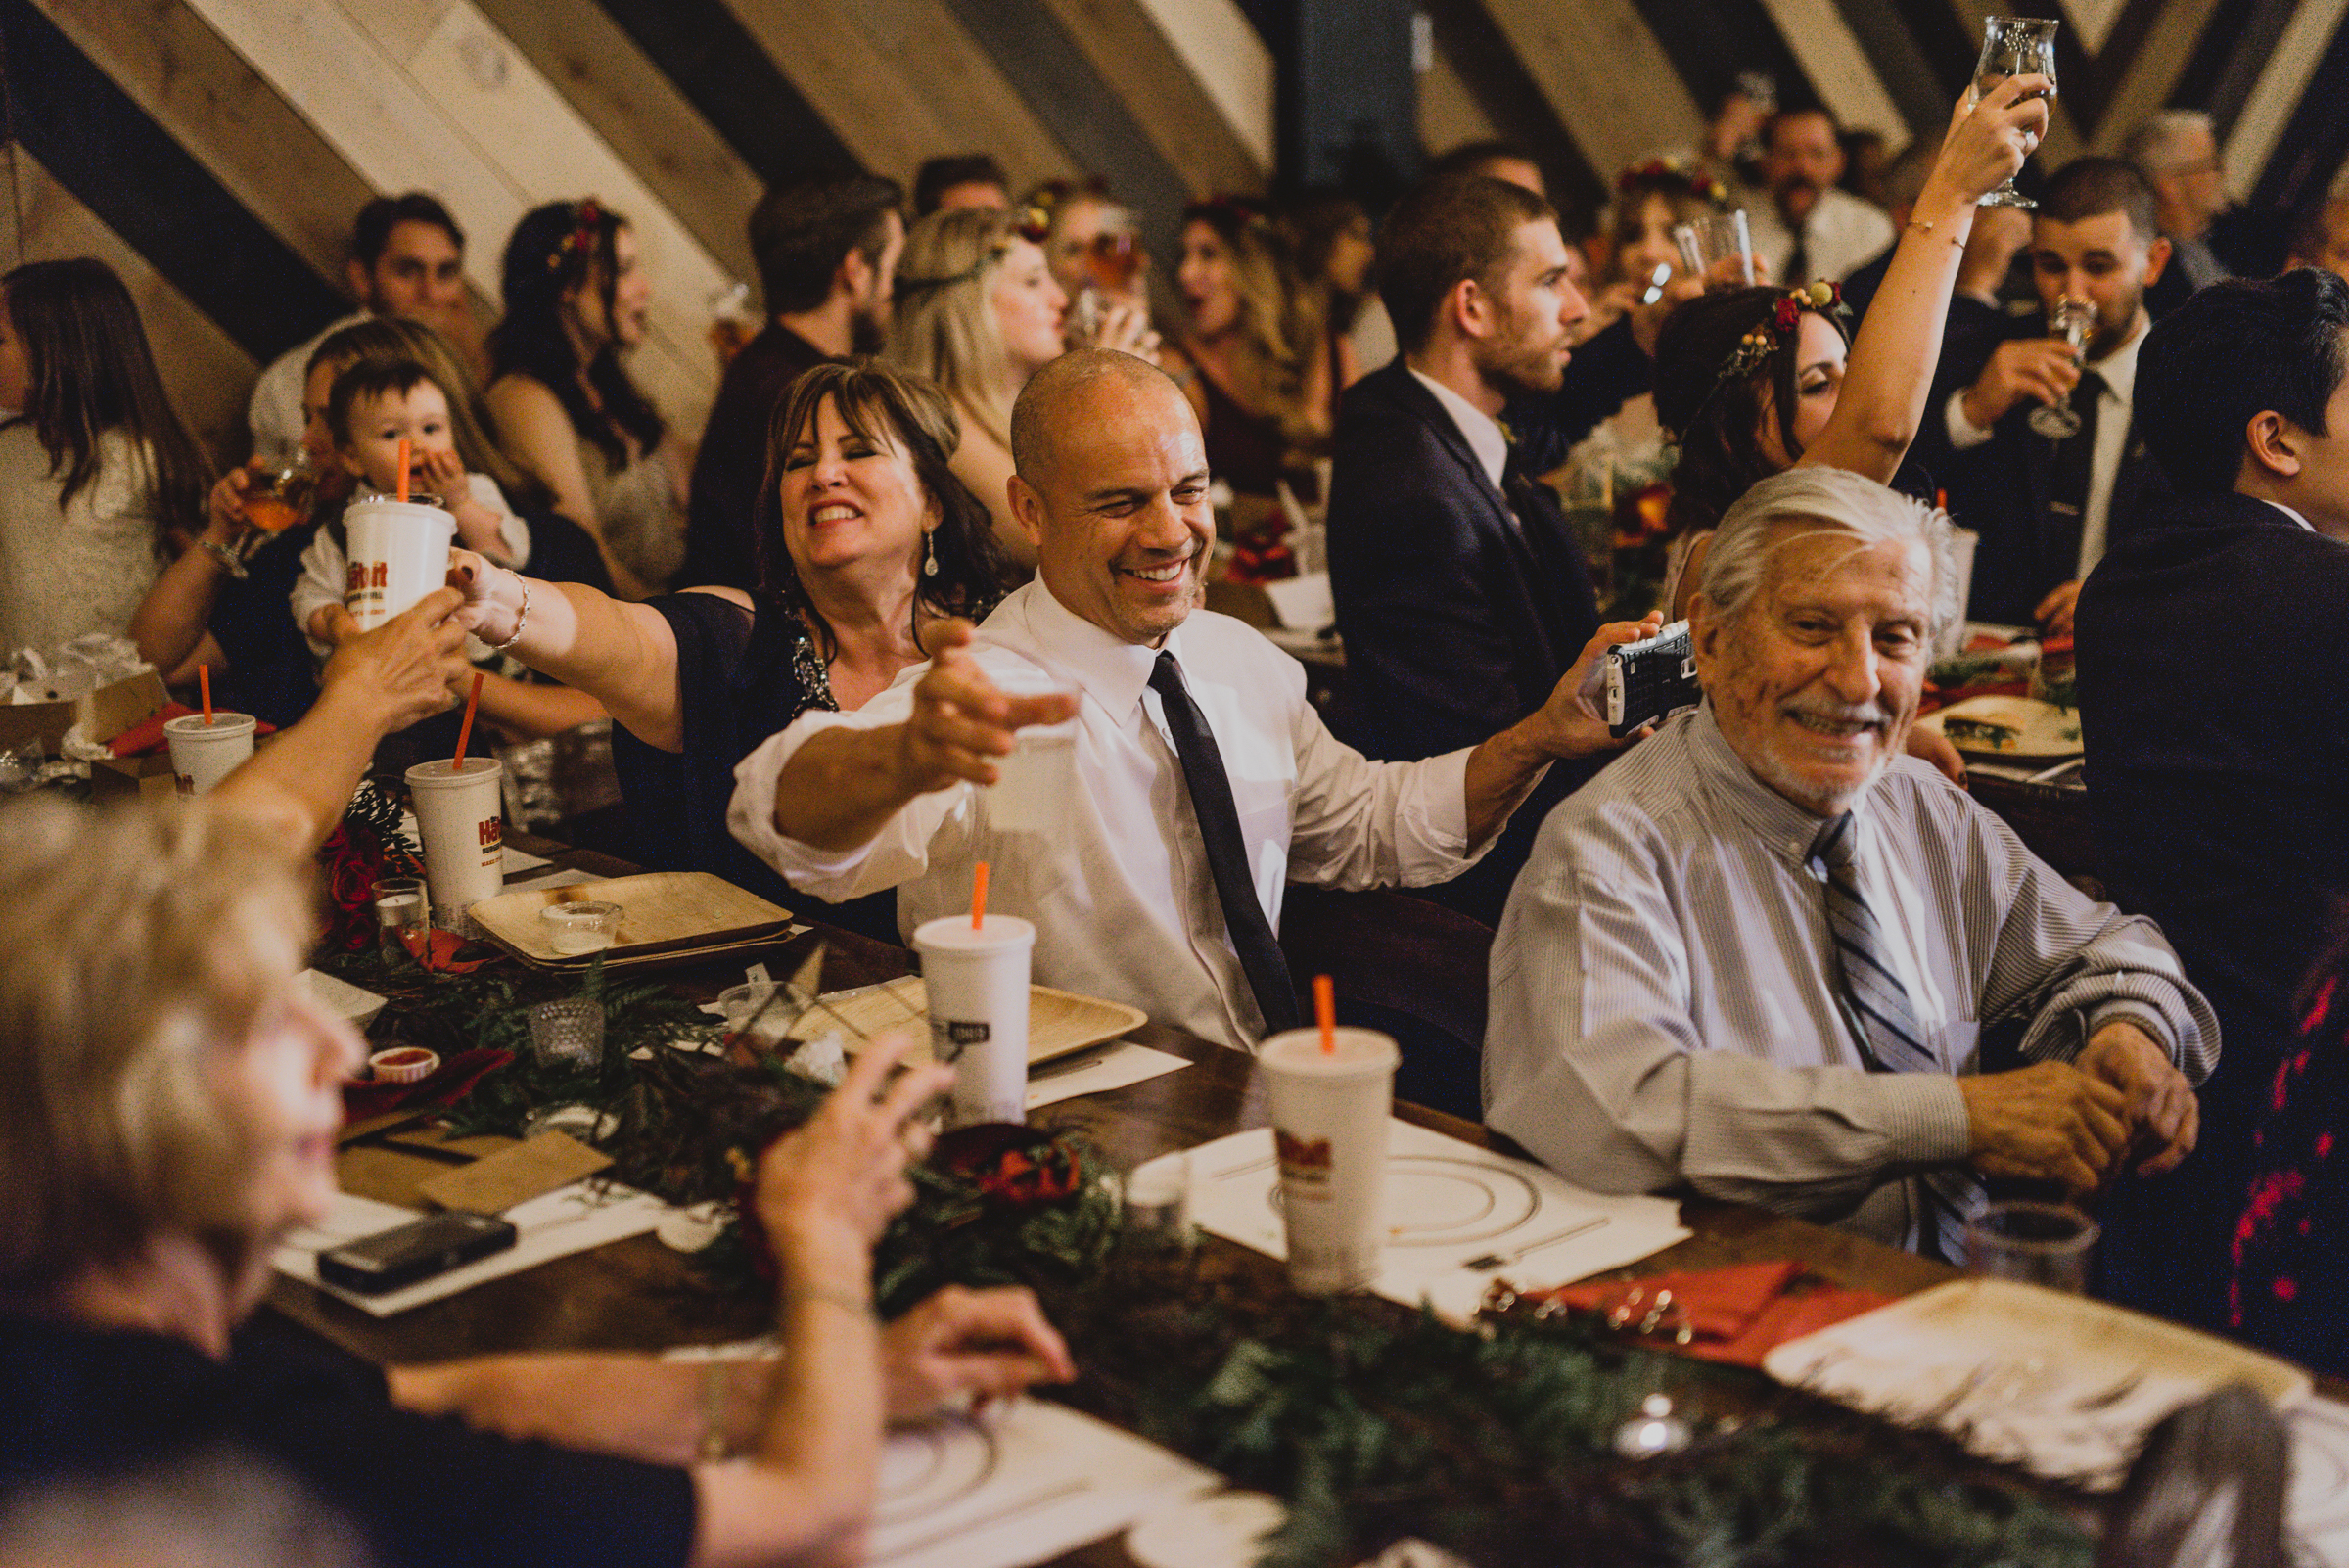 ©Isaiah + Taylor Photography - The Woodshed Booze Brothers Wedding, Vista California Wedding Photographer-142.jpg